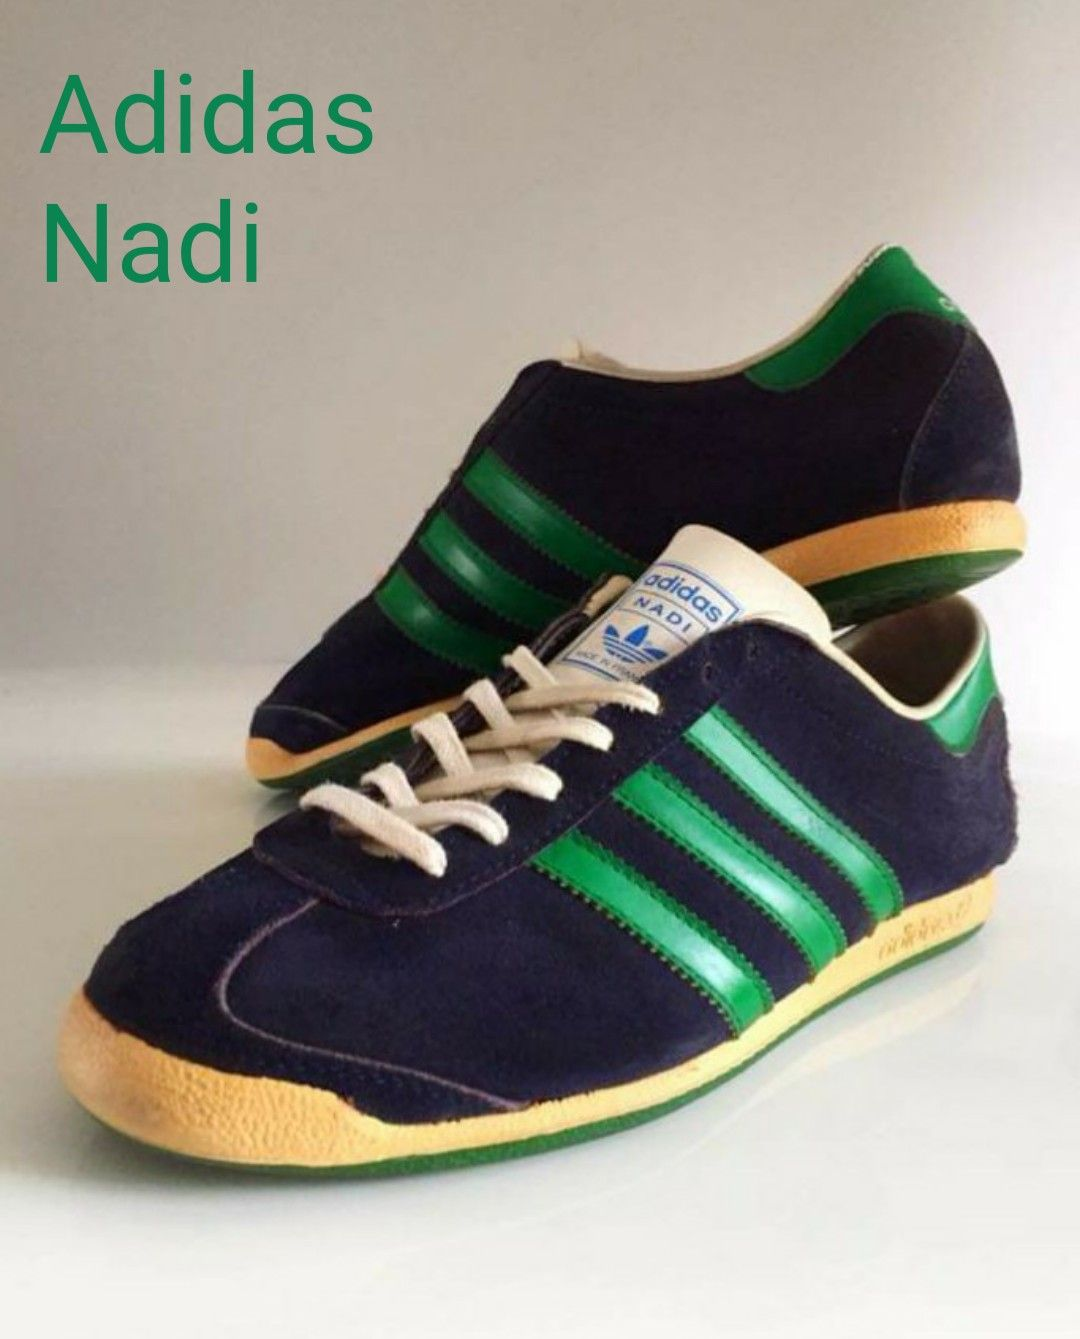 curva aventuras Volverse loco  Vintage French made Adidas Nadi - superb! | Vintage adidas, Sneakers,  Vintage sneakers